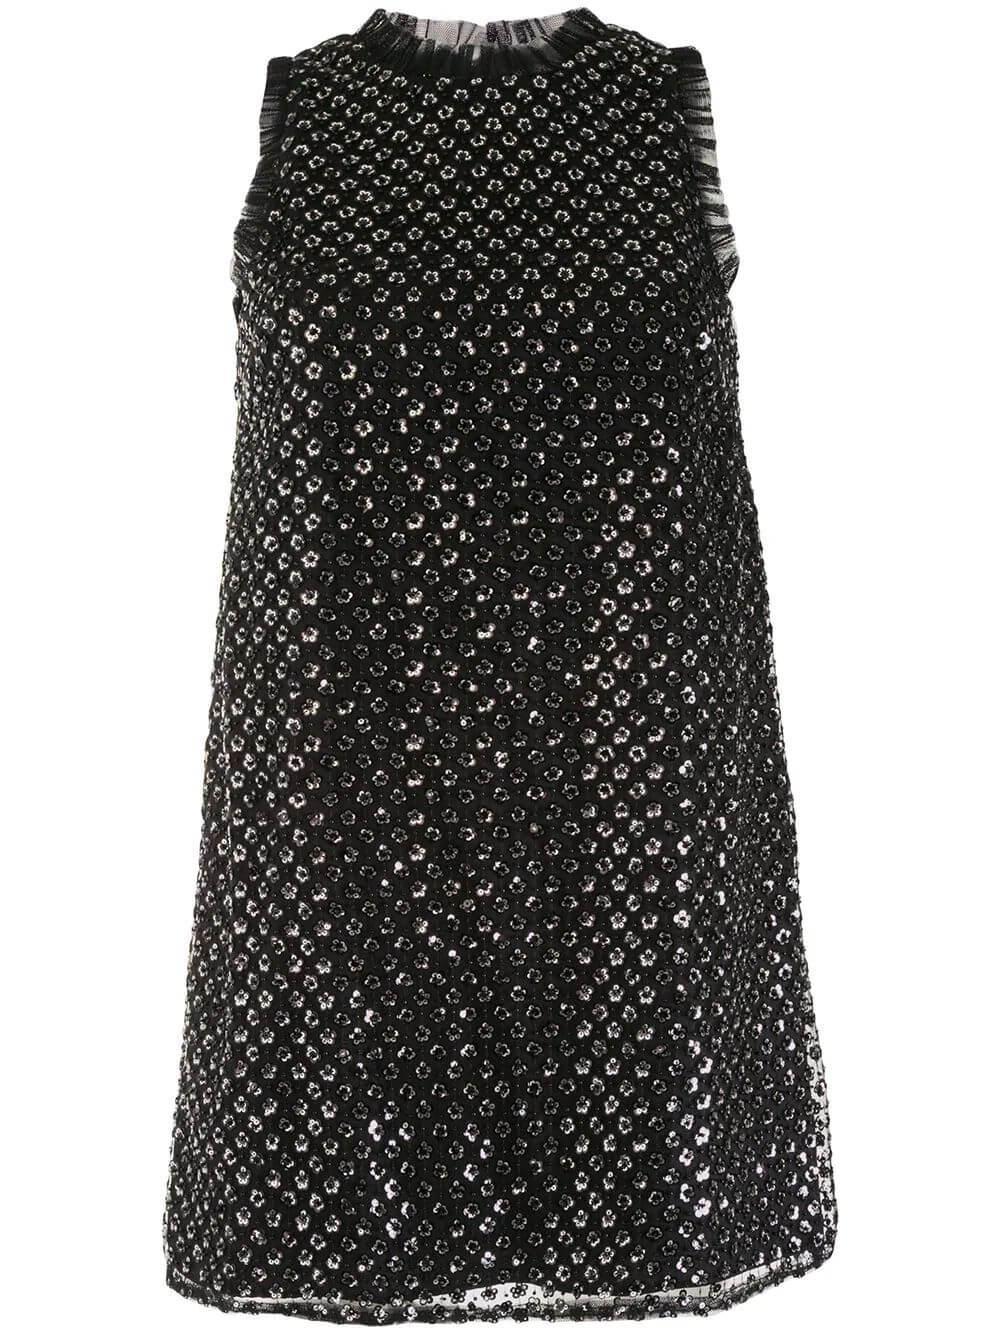 Sequin Trapeze Mini Dress